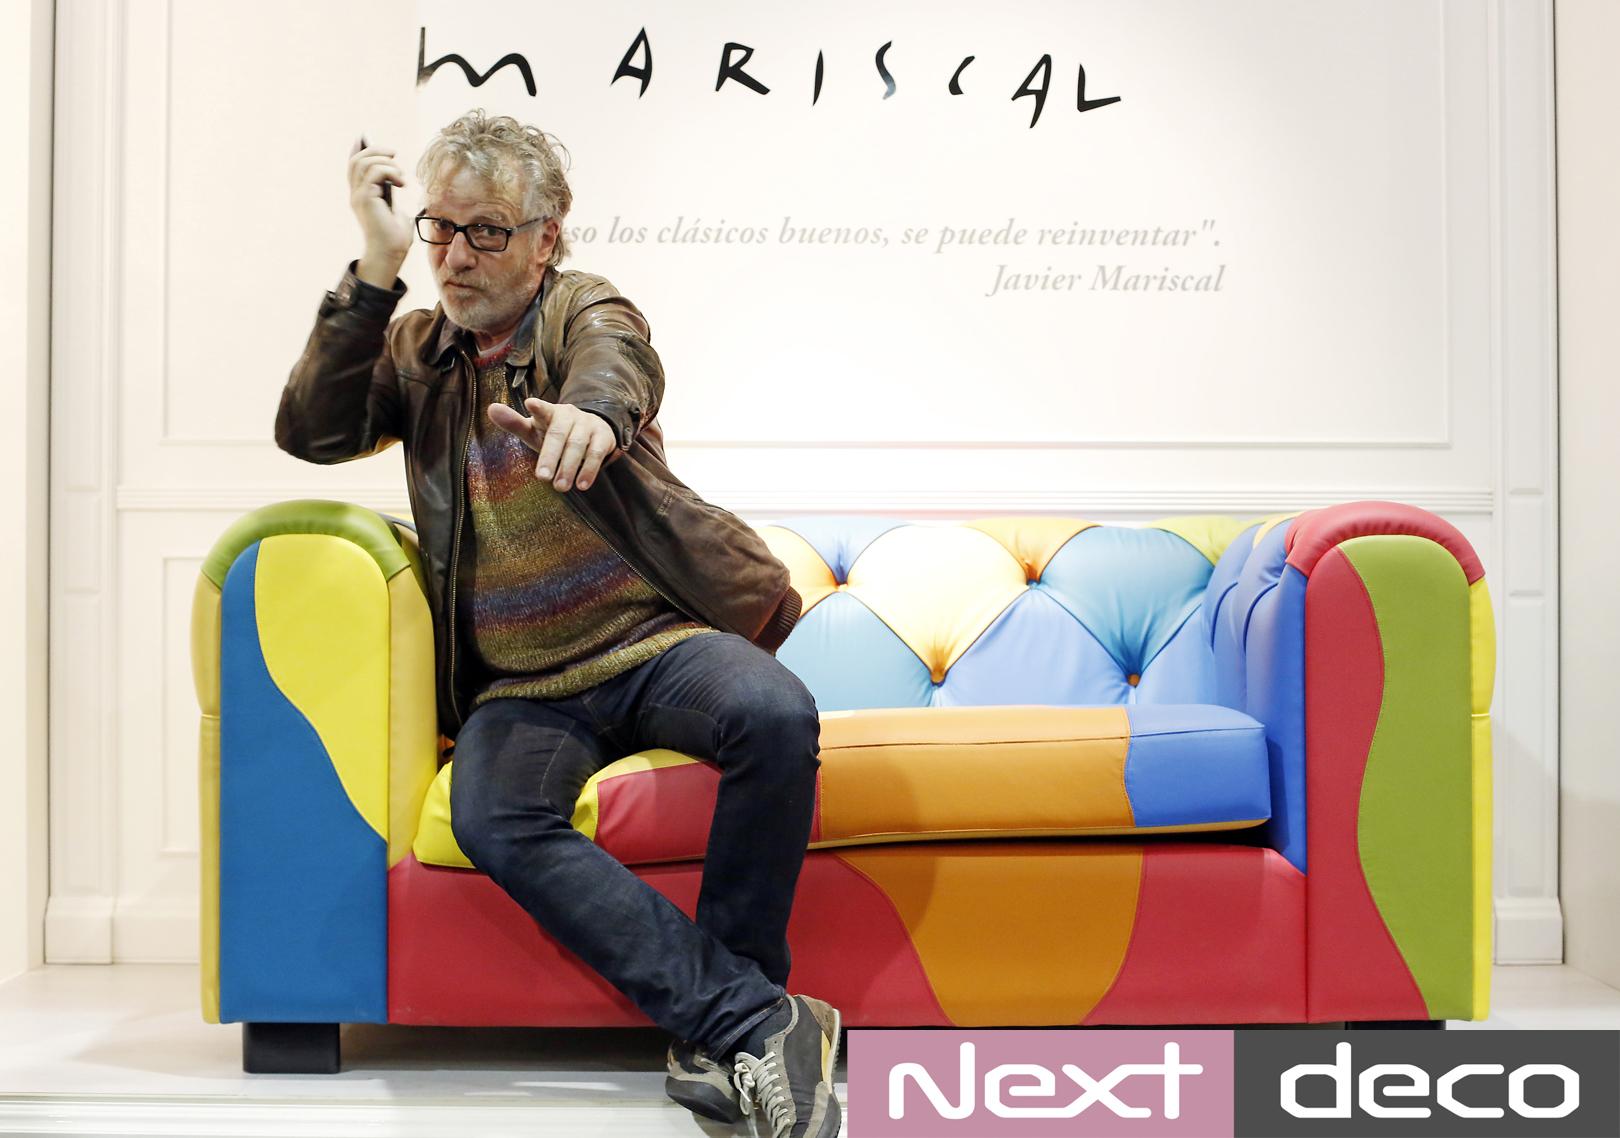 mariscal-chester-sofa-canella-mobiliario-diseno-nextdeco